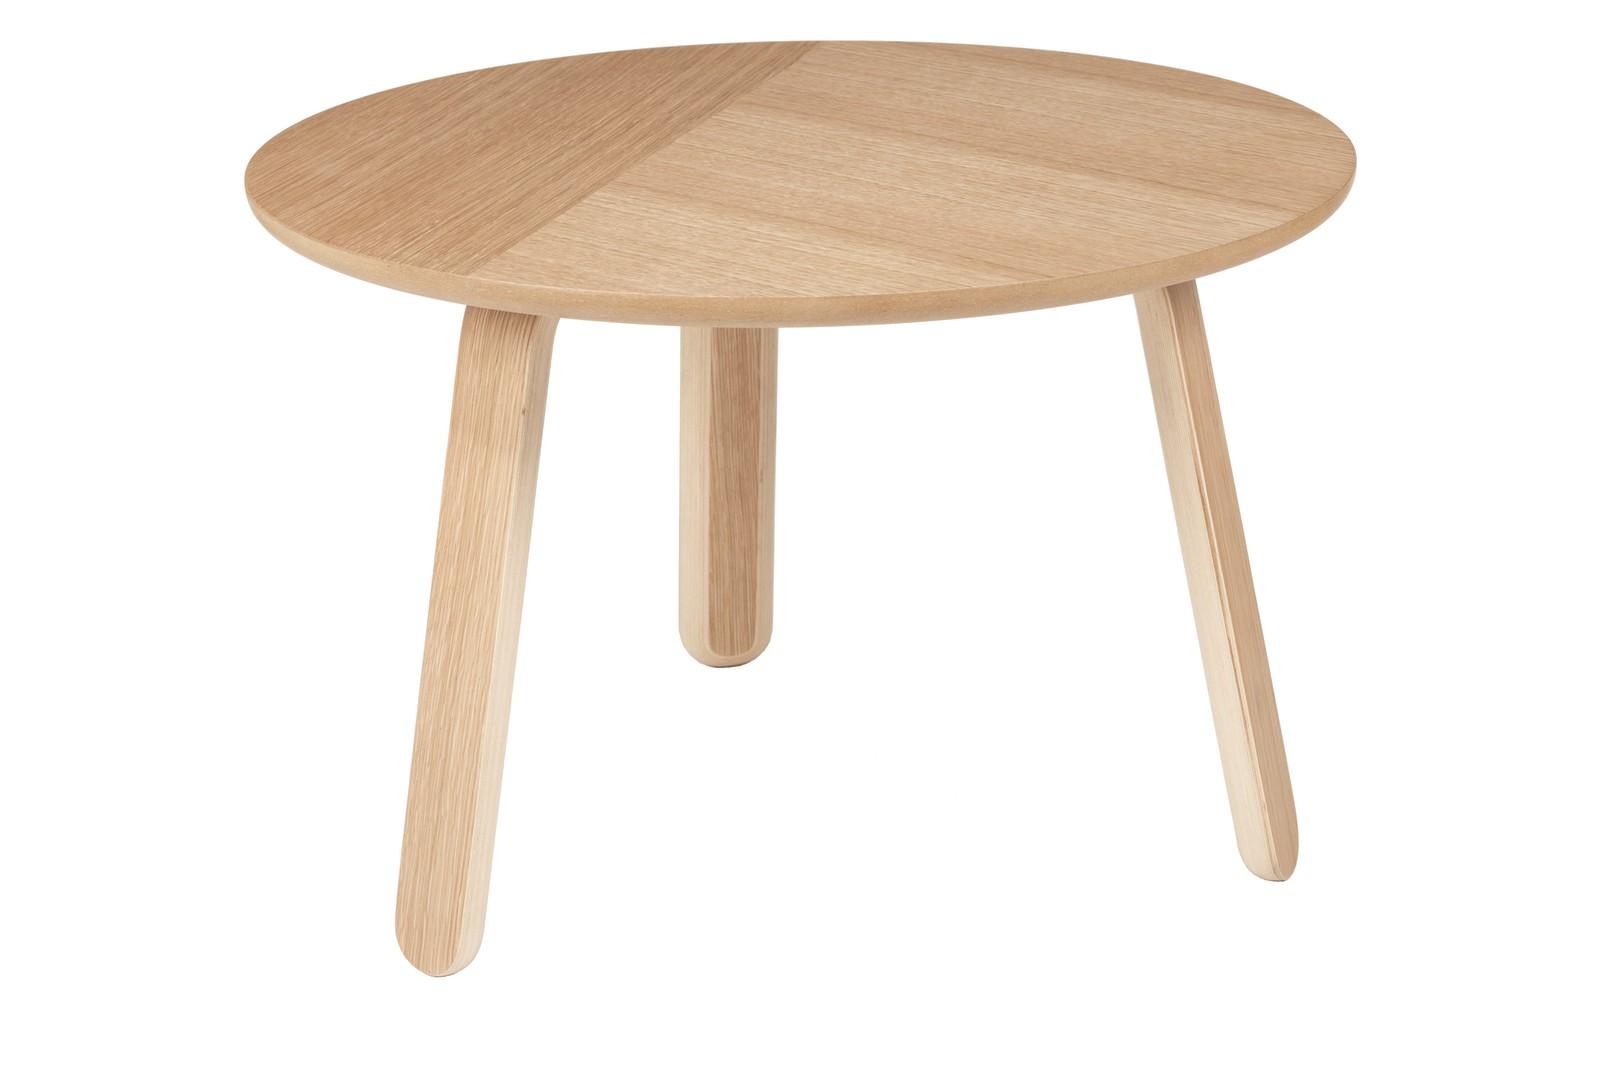 Paper Coffee Table Gubi Wood Oak, Medium Ø60